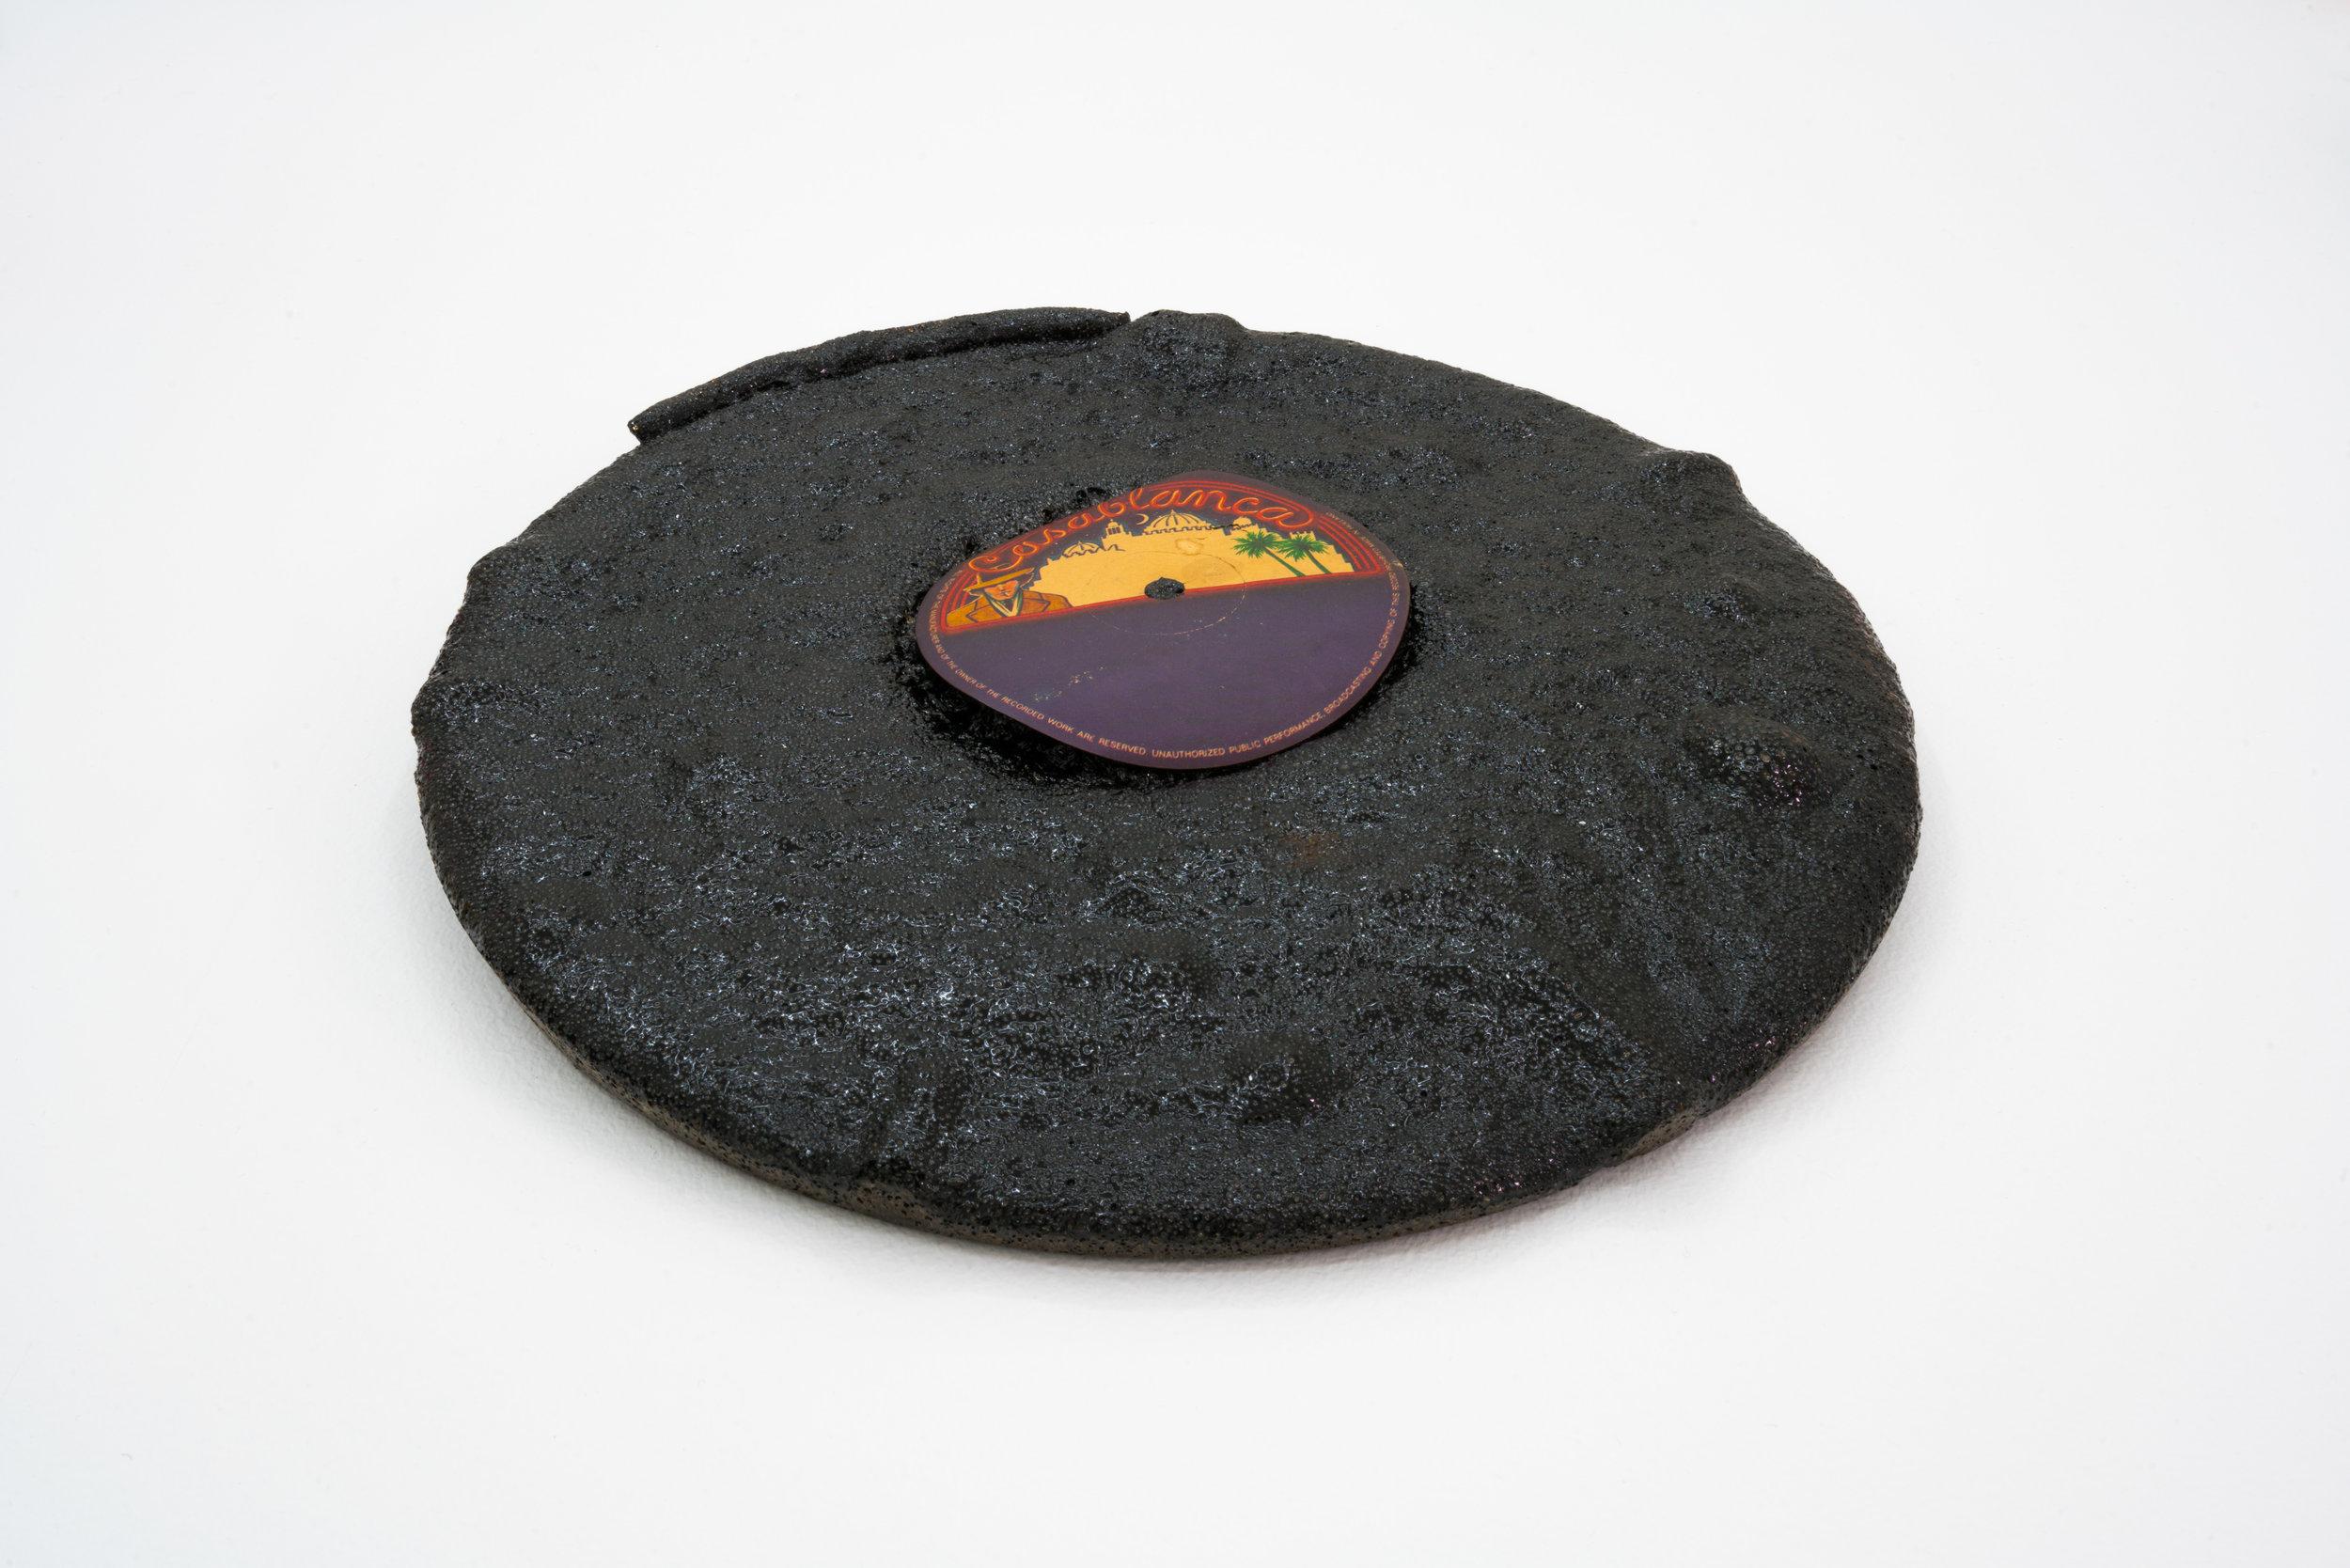 Remko Scha,  Plastic Meltdown , 1962-1992, Plastic, 3 x 29 x 29 cm